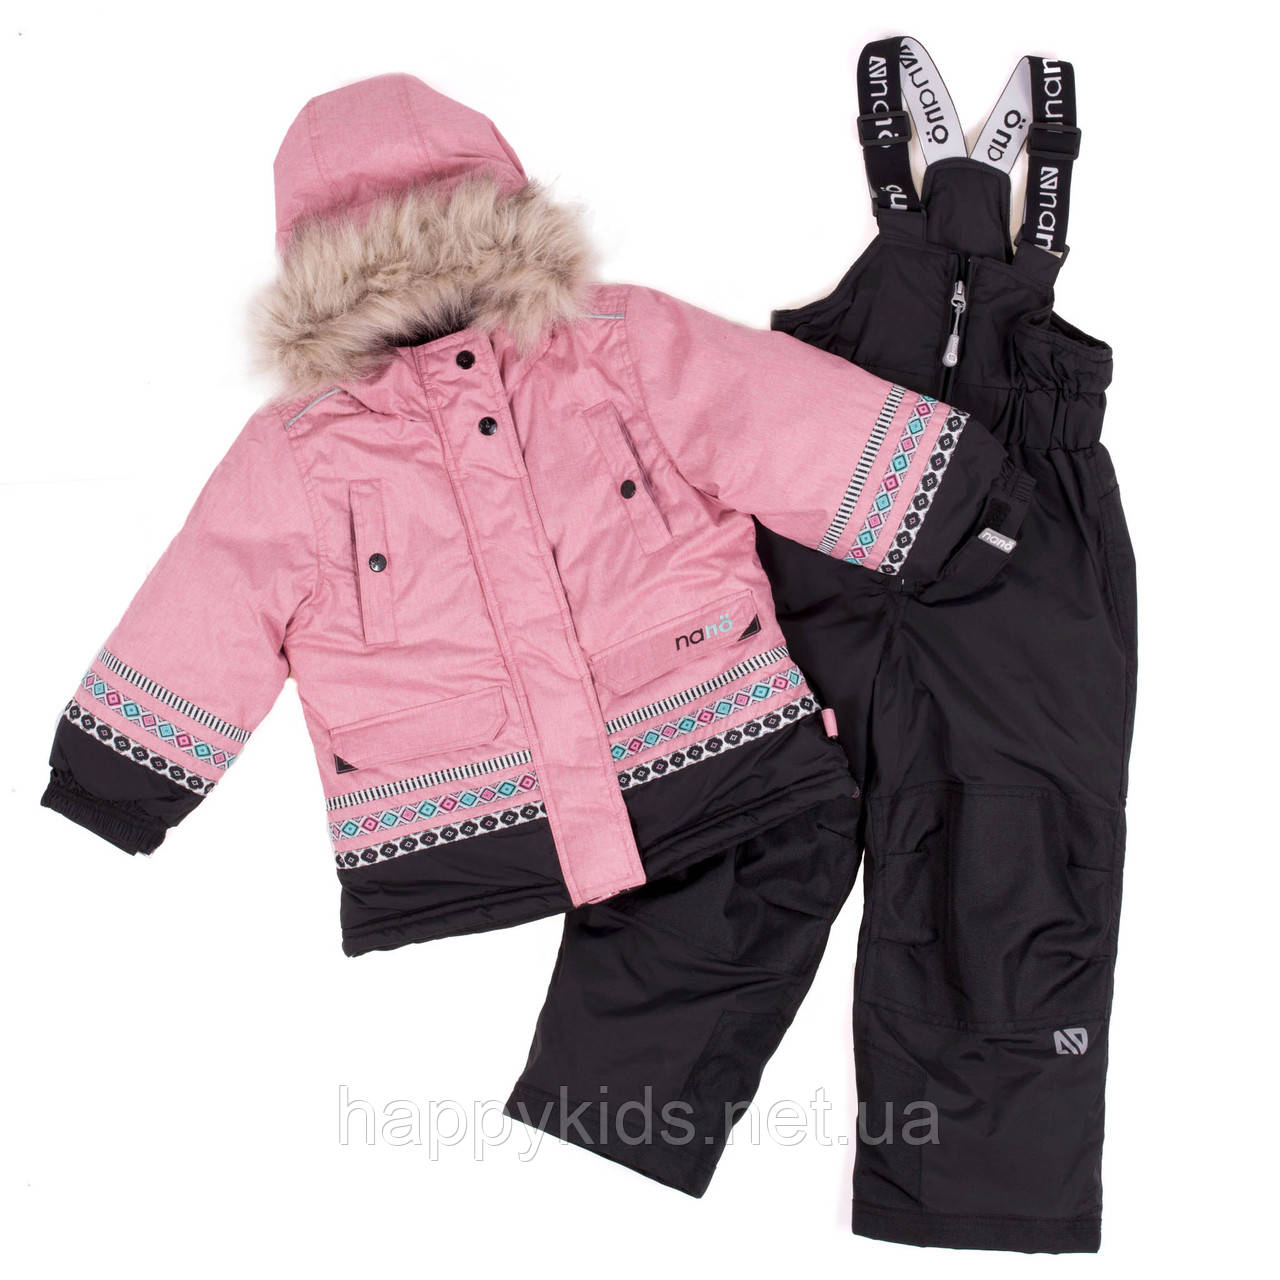 Зимний комплект для девочки NANO F18 M 252 Vintage Pink. Размеры 2-12.